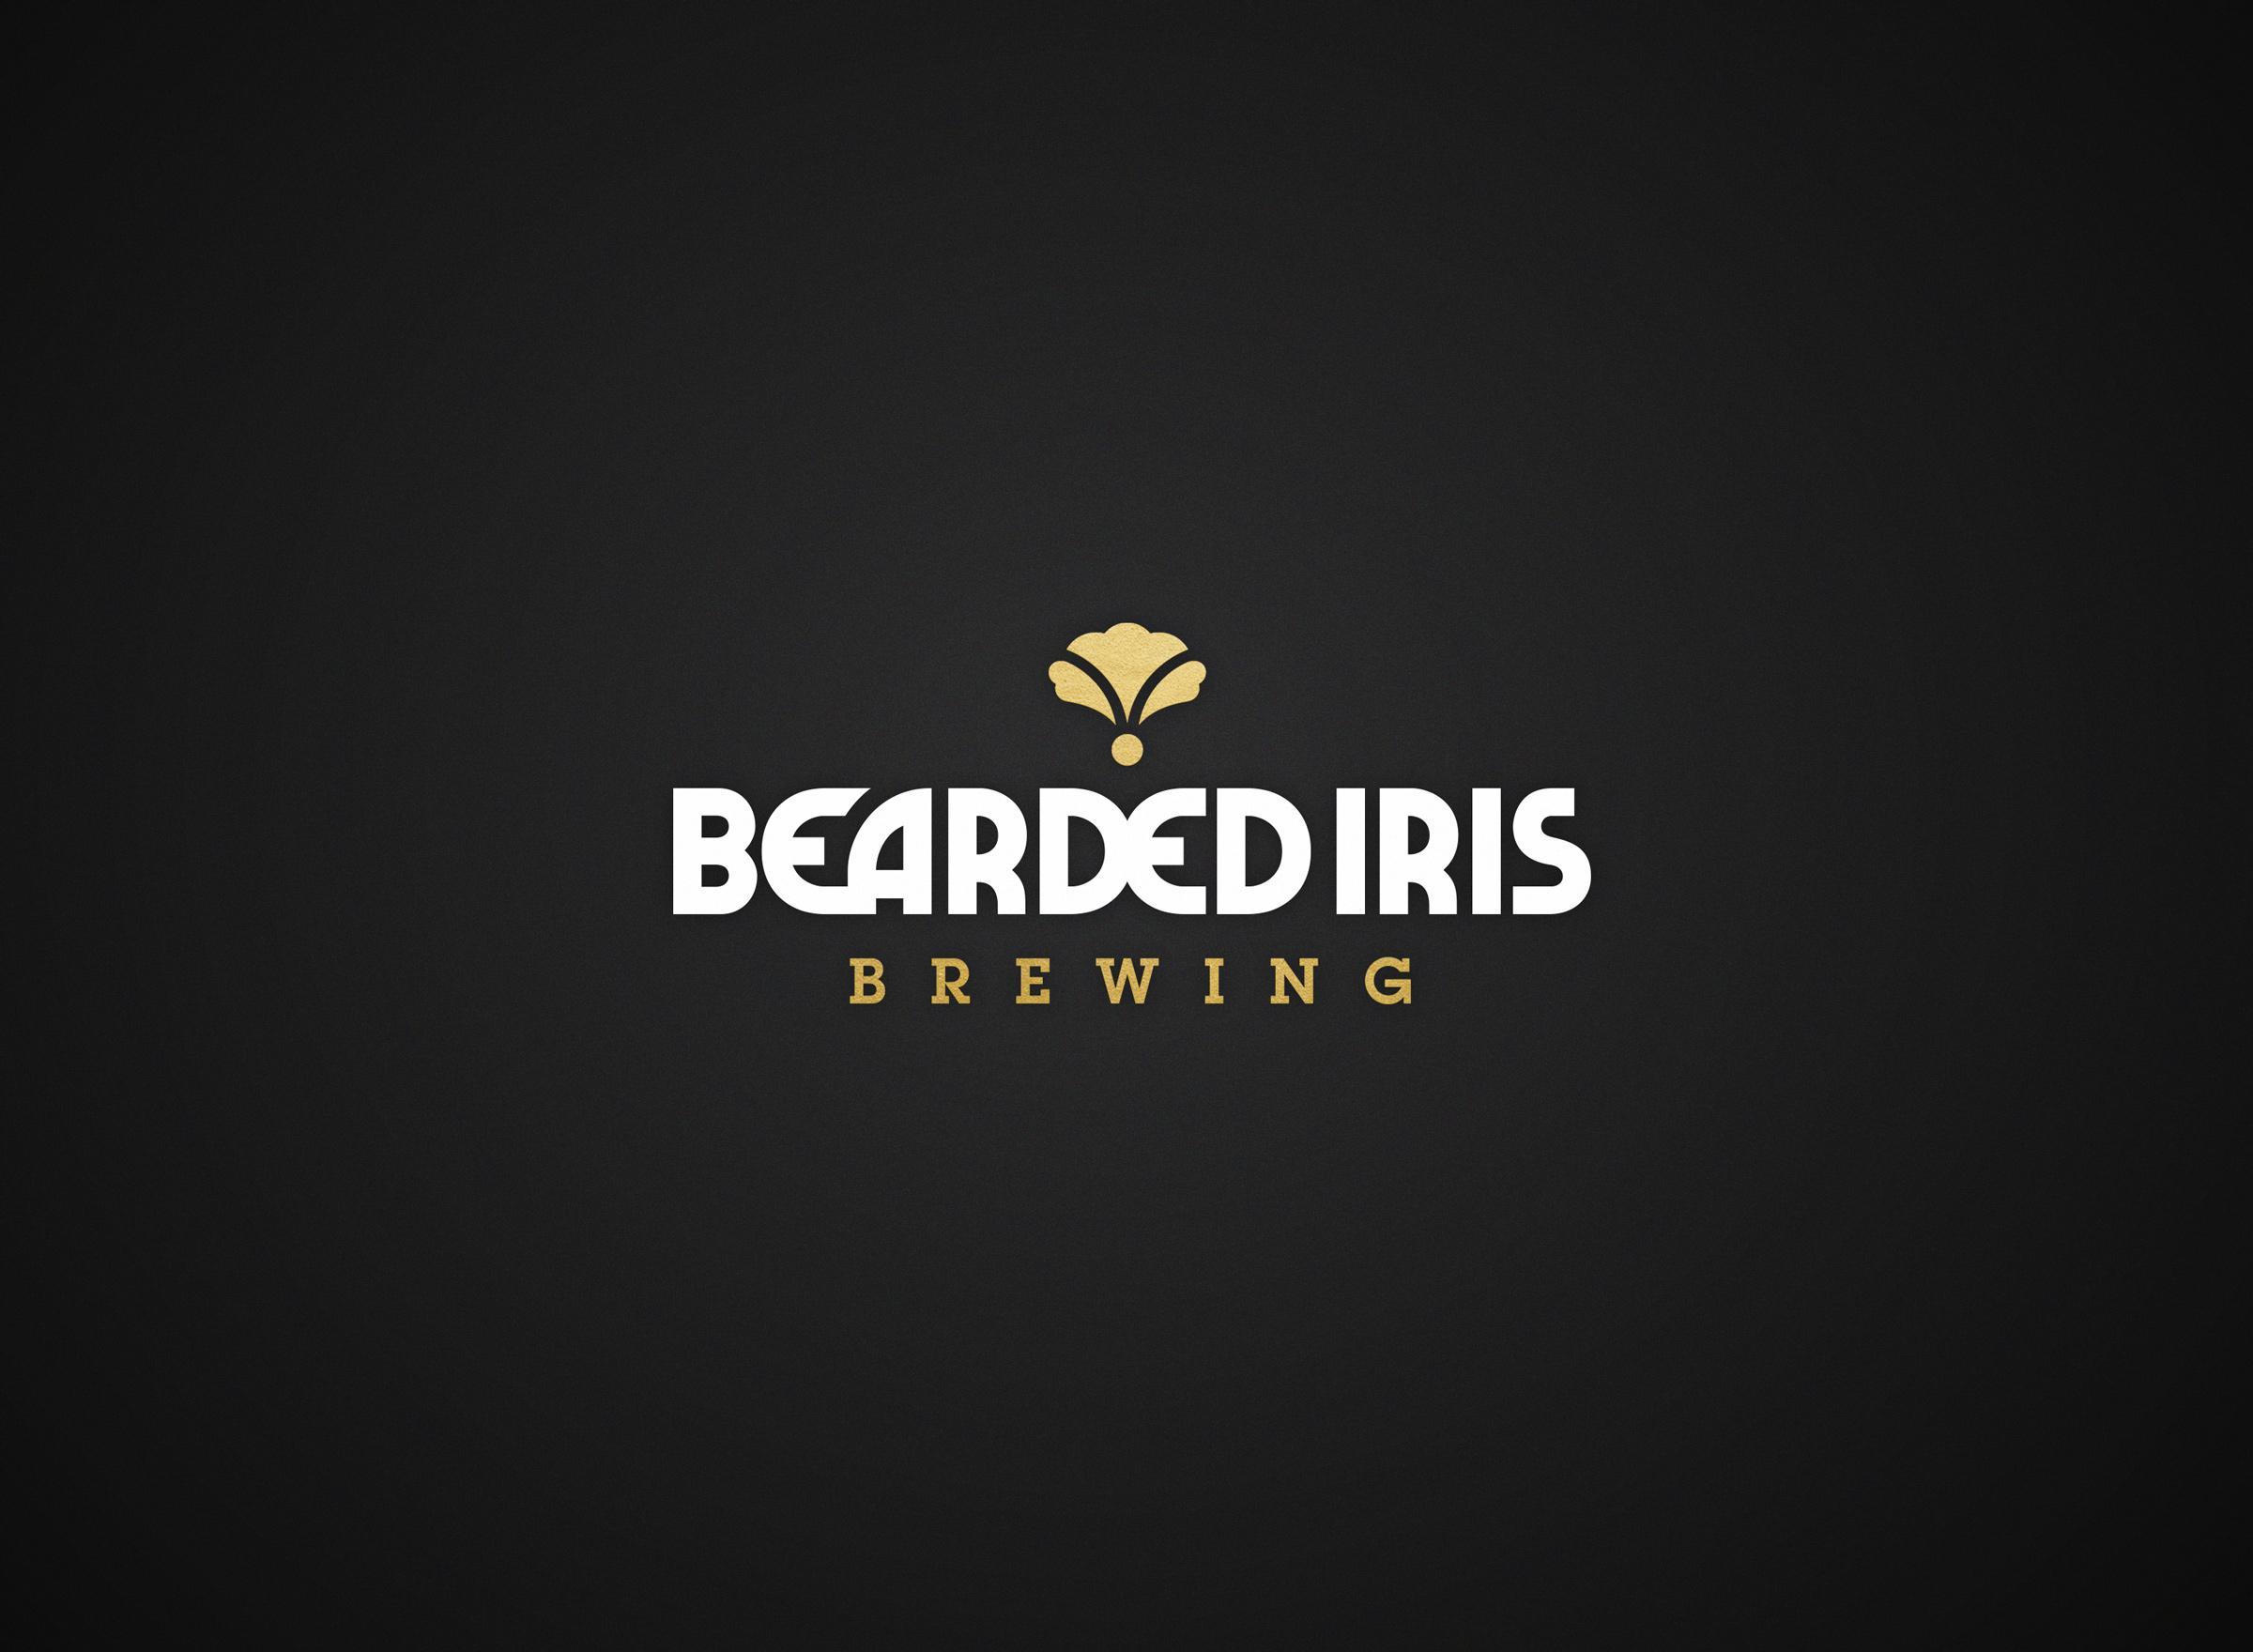 Bearded_Iris_Brewing_CO_main_logo.jpg